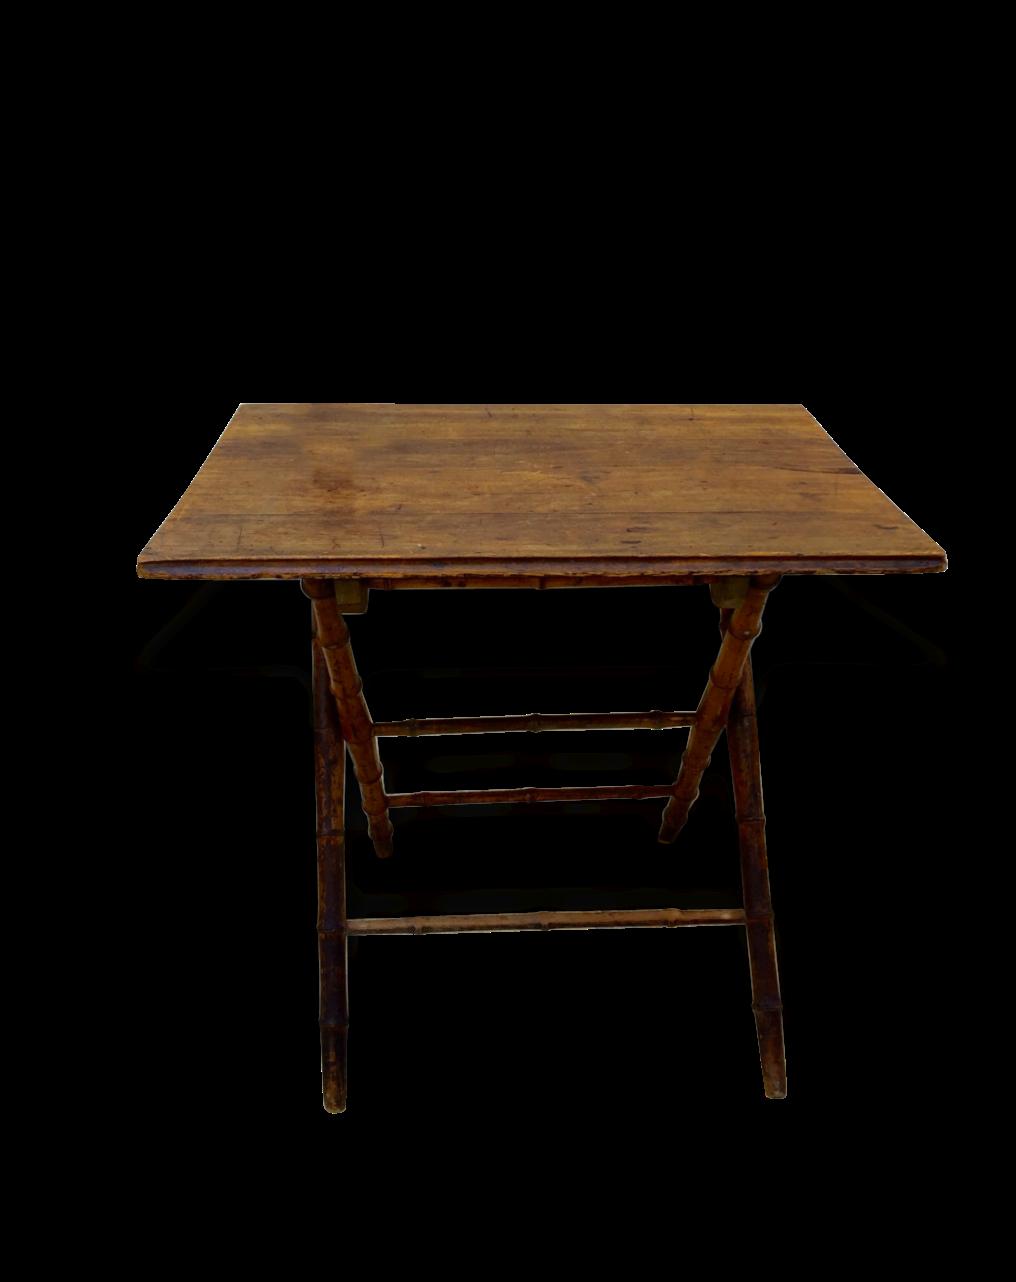 Table Ancienne Pliante Pieds Bois Massif Imitation Rotin 1920